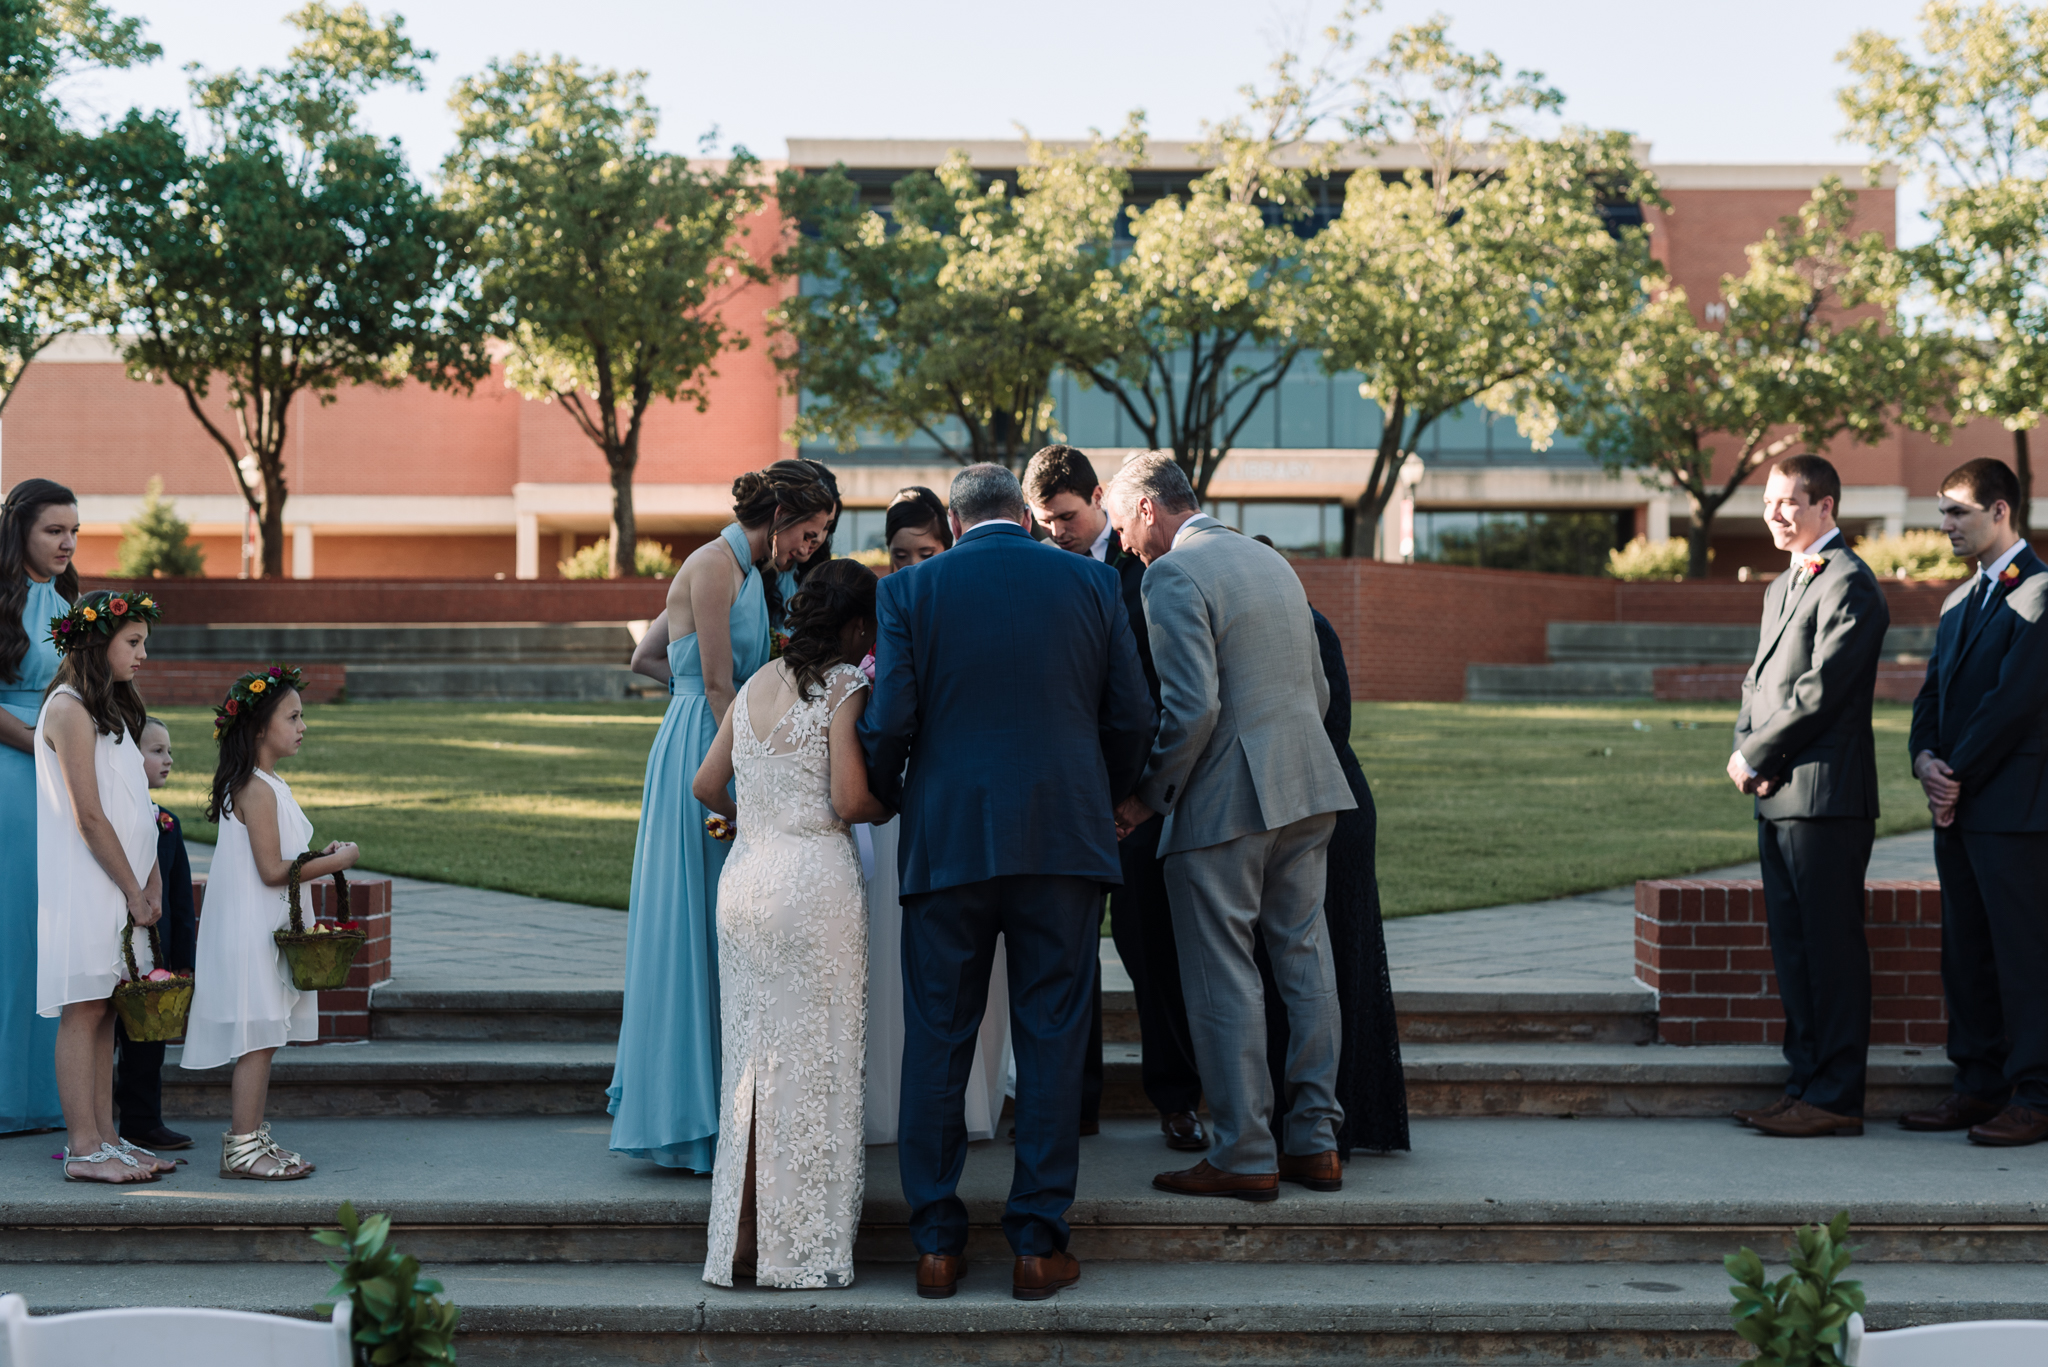 Oklahoma-Christian-University-Wedding-8240.jpg